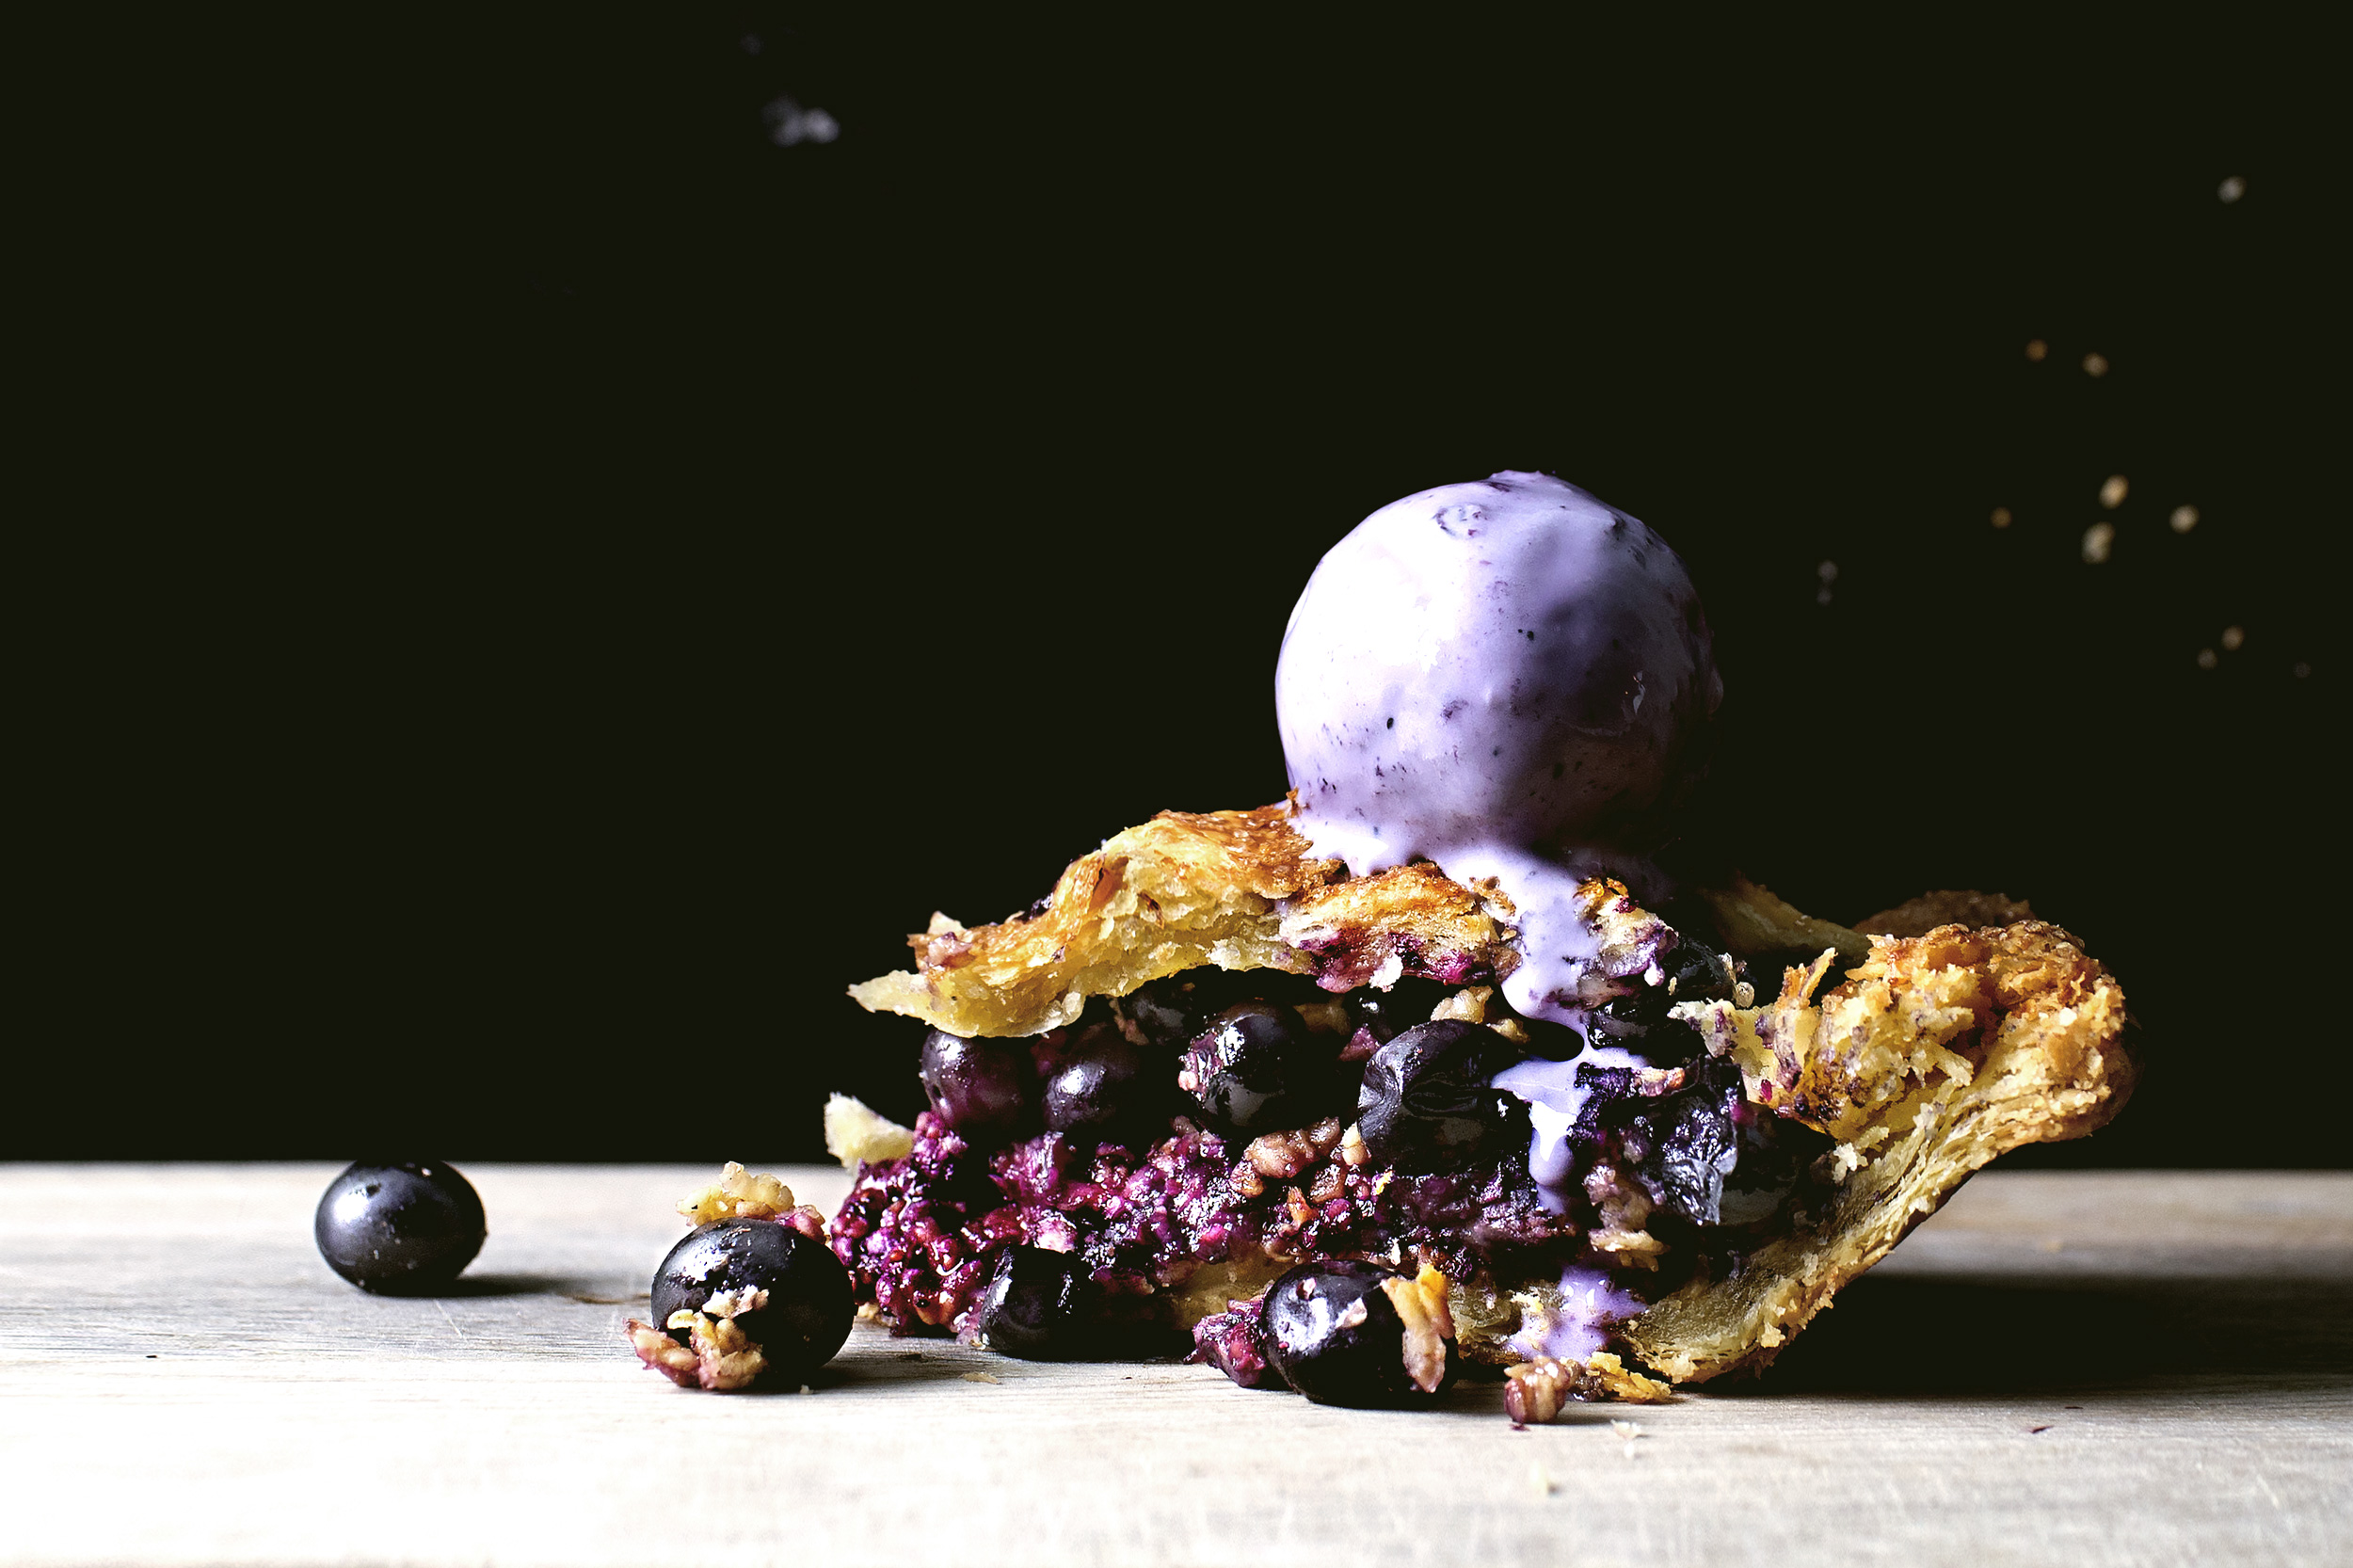 sp-blueberry-pie19